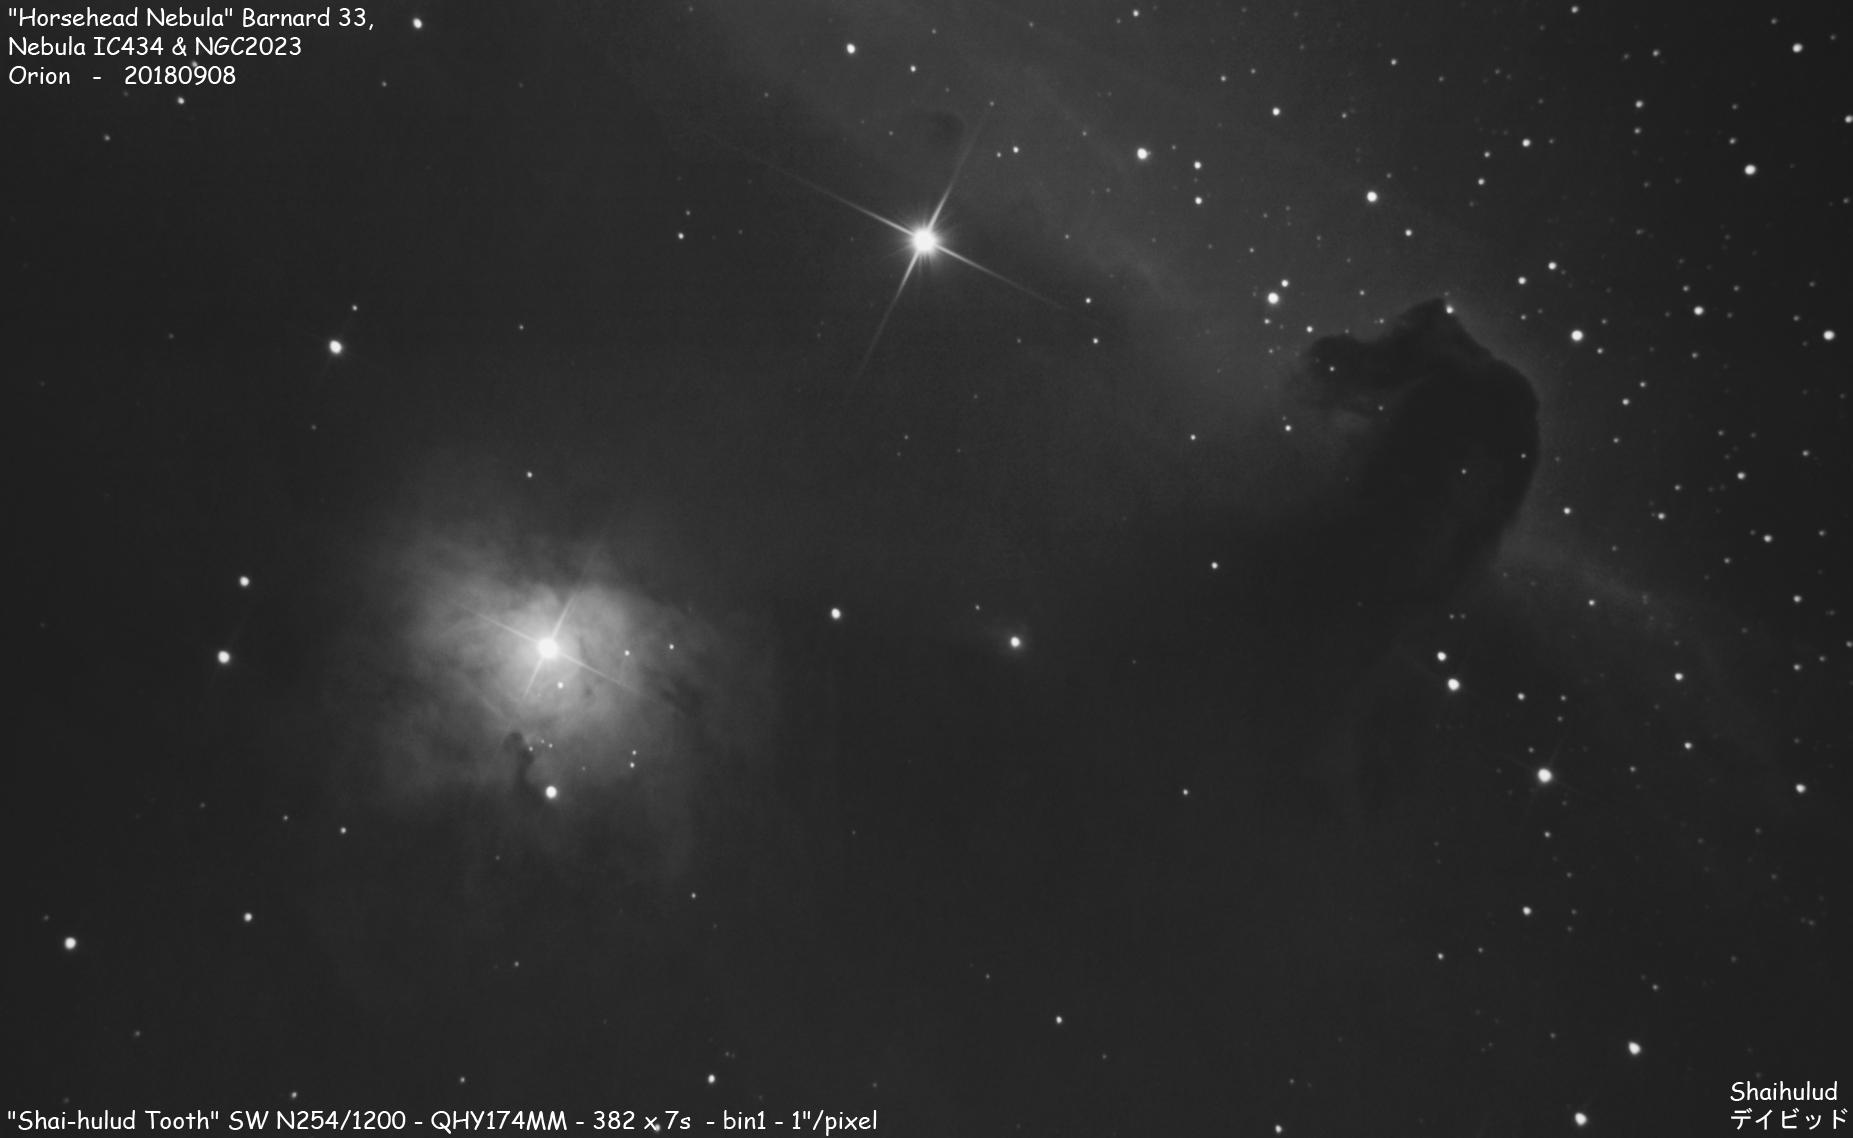 Deep Sky Planetary Technique (by Shaihulud) HQqVYpJJEABF_16536x16536_wmhqkGbg